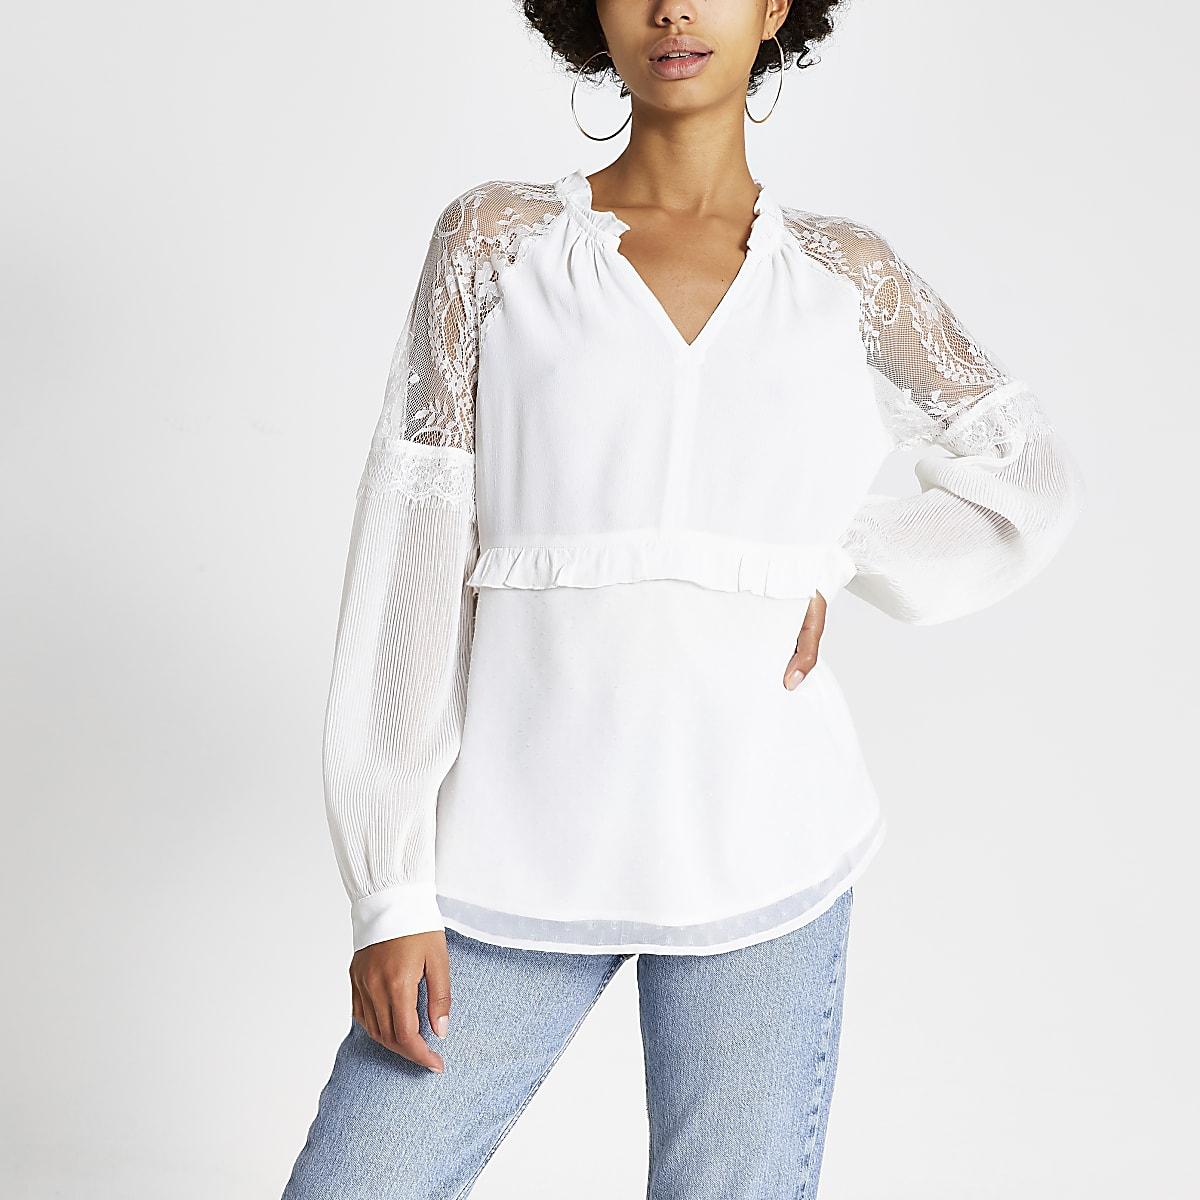 Cream lace long sheer sleeve V neck top